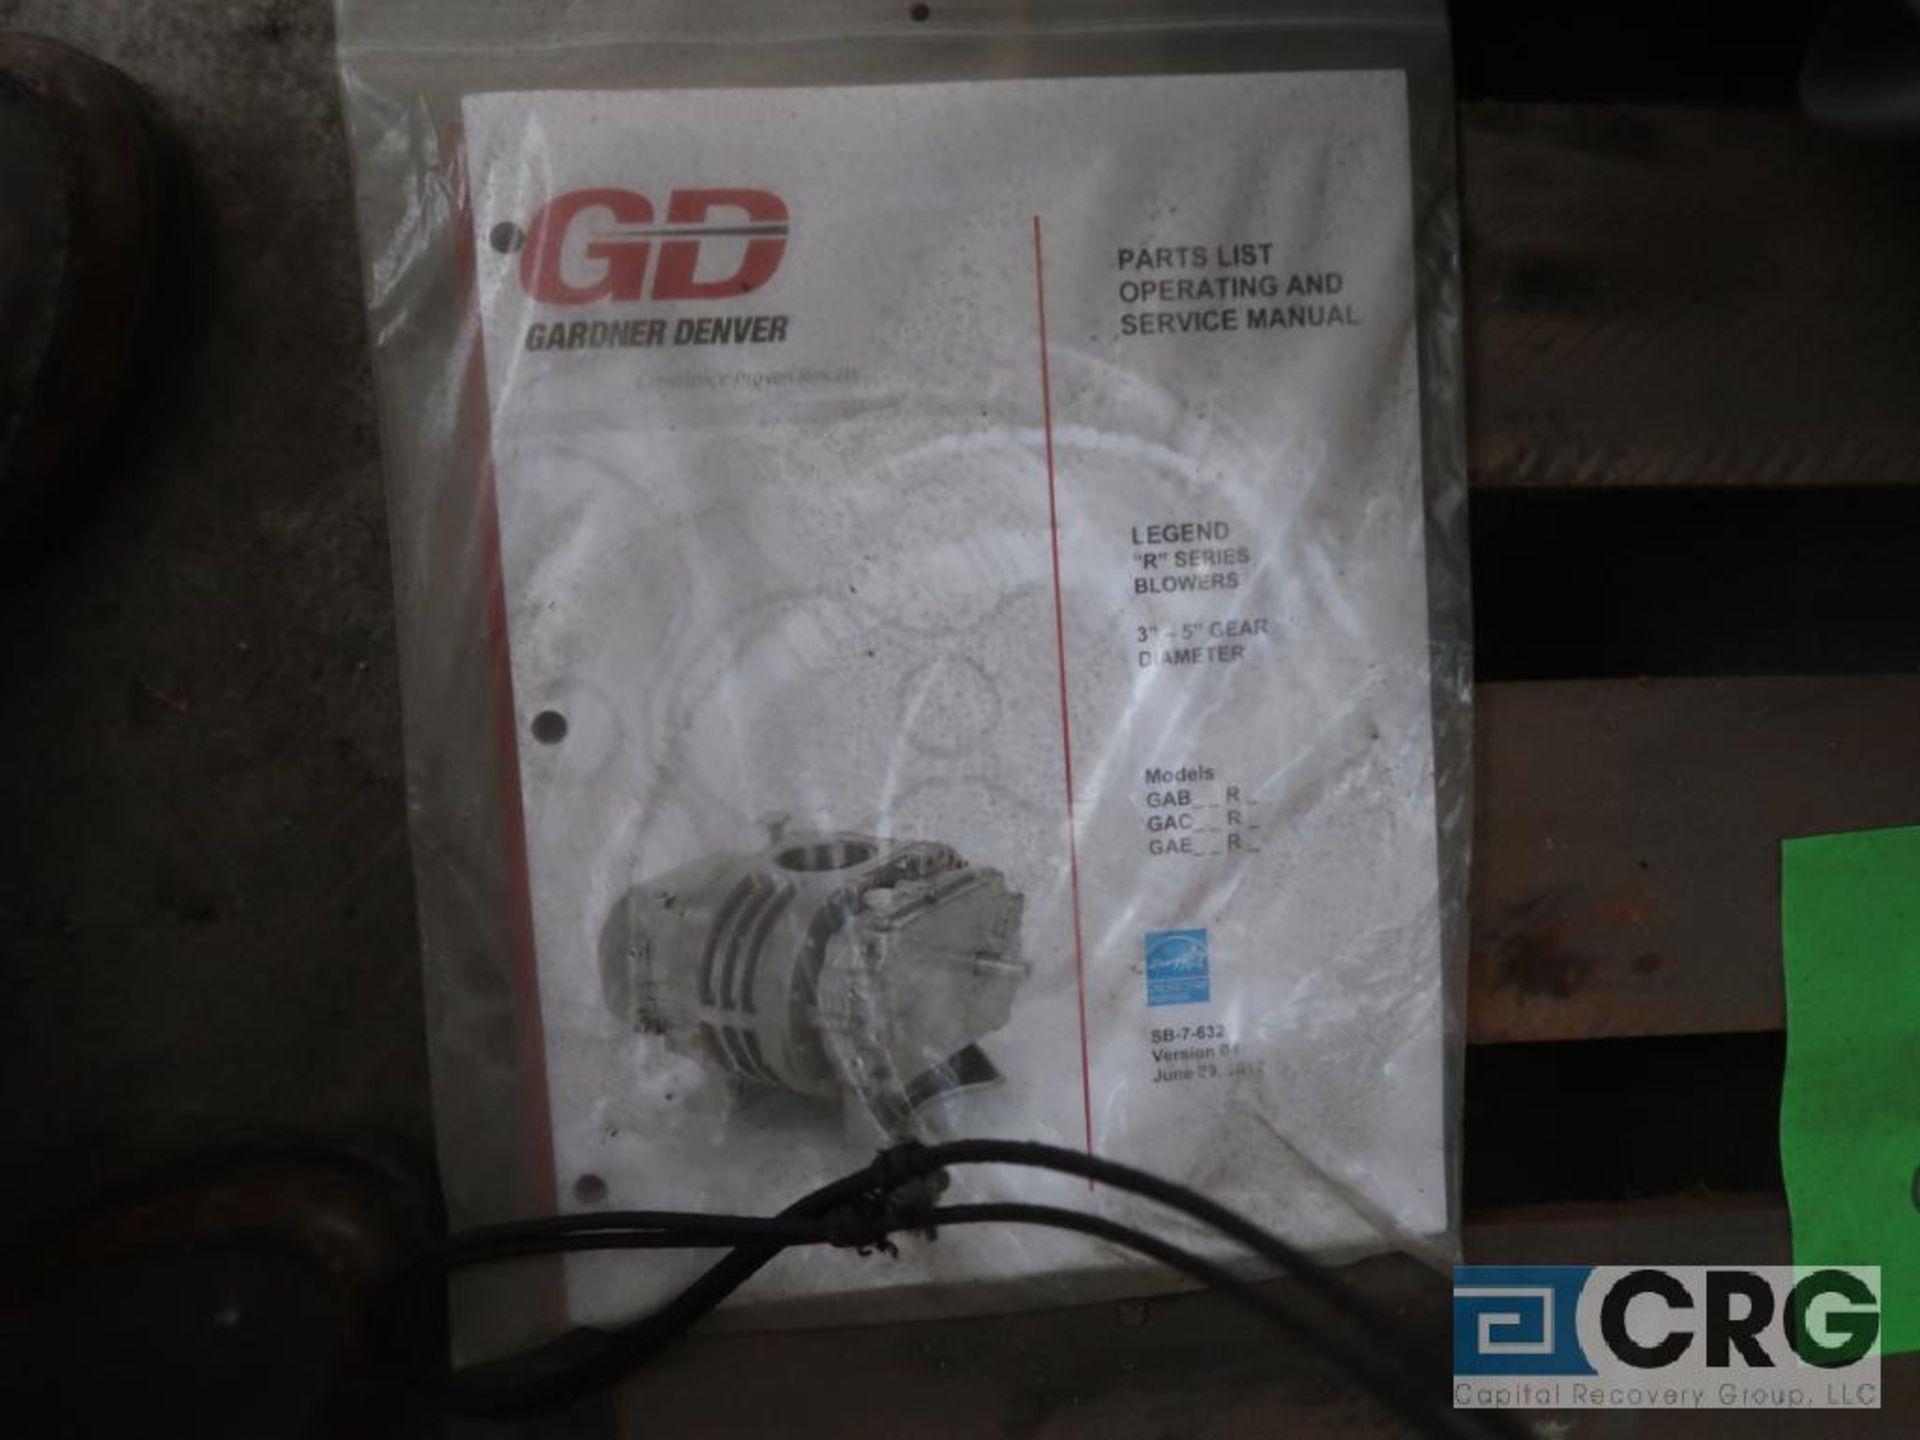 Gardner Denver GAELDRA 5 LR rotary blower, s/n 472724 (Off Site Warehouse) - Image 2 of 2